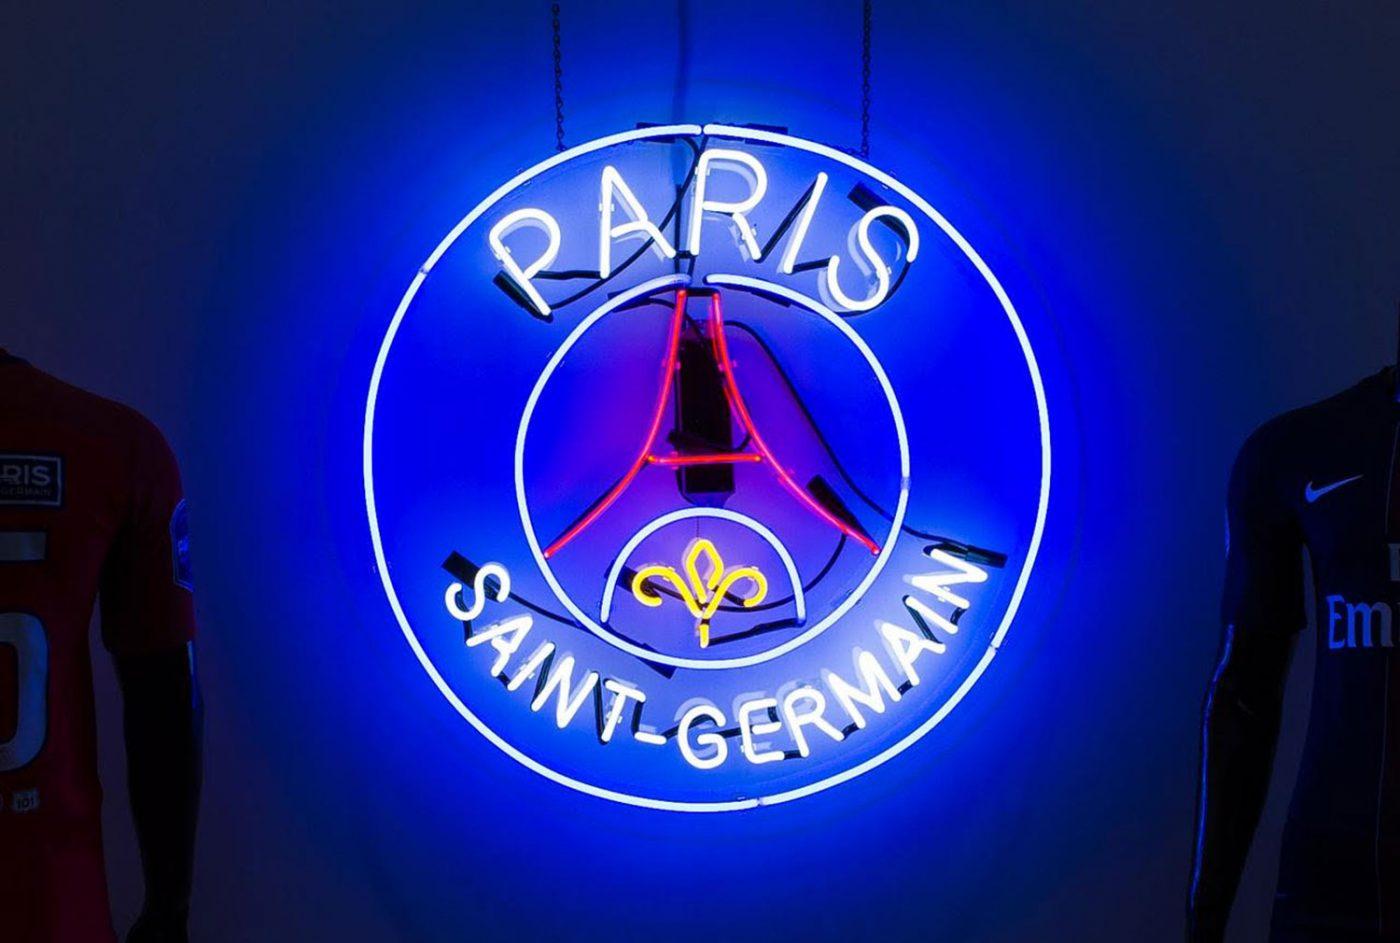 AntonioBrasko-Paris-SaintGermain-LaGalerie-PopUp-TheSeventhLetter-LosAngeles-ArtGallery-Art-Design-Graffiti-SprayPaint-Boombox-Soccer-Futbol-PSG 19.jpg